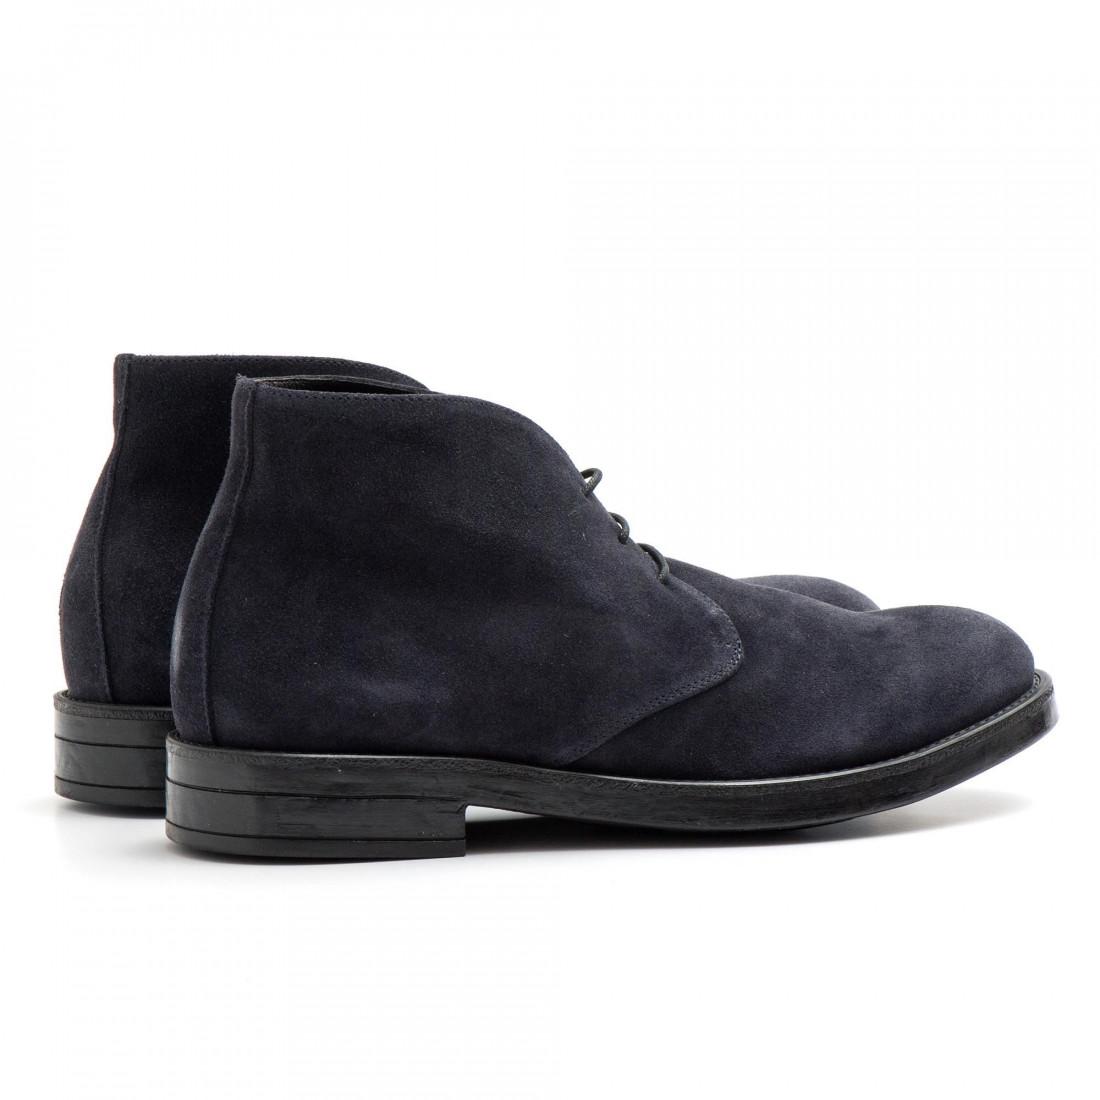 finest selection 3a39b d02cc Blue suede Eveet lace up ankle boots